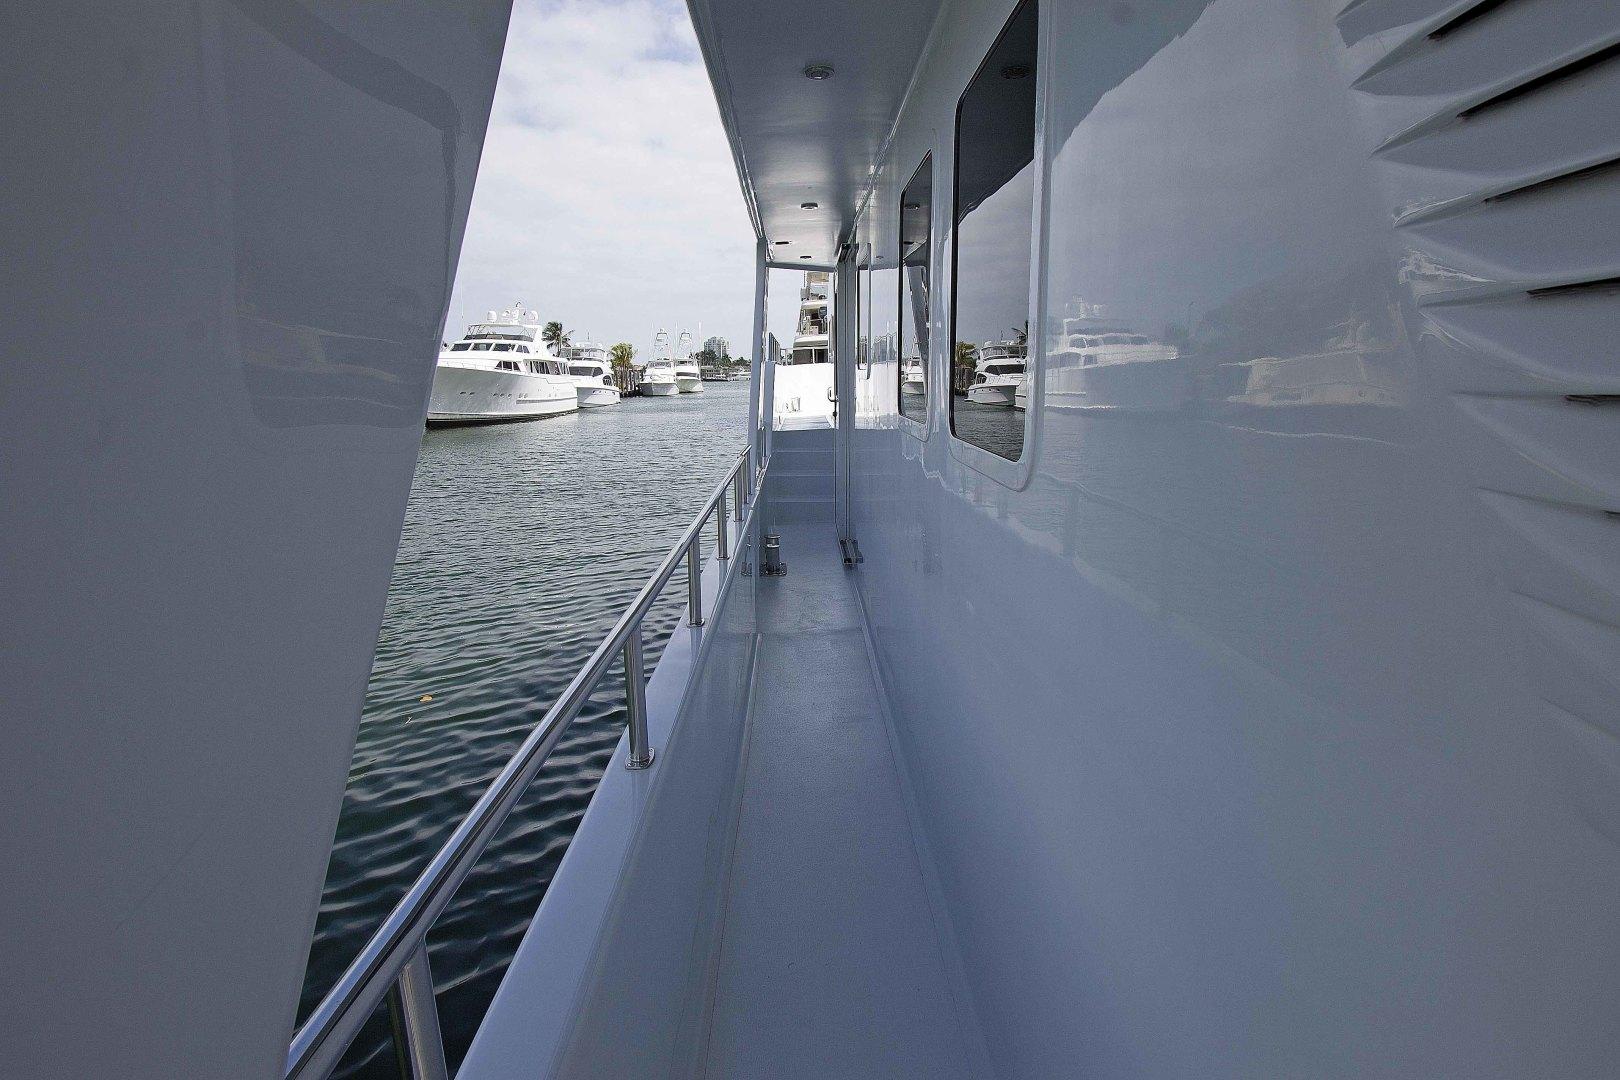 Theriault & Son-Custom Catamaran 2000-Slumber Venture Fort Lauderdale-Florida-United States-1625418 | Thumbnail